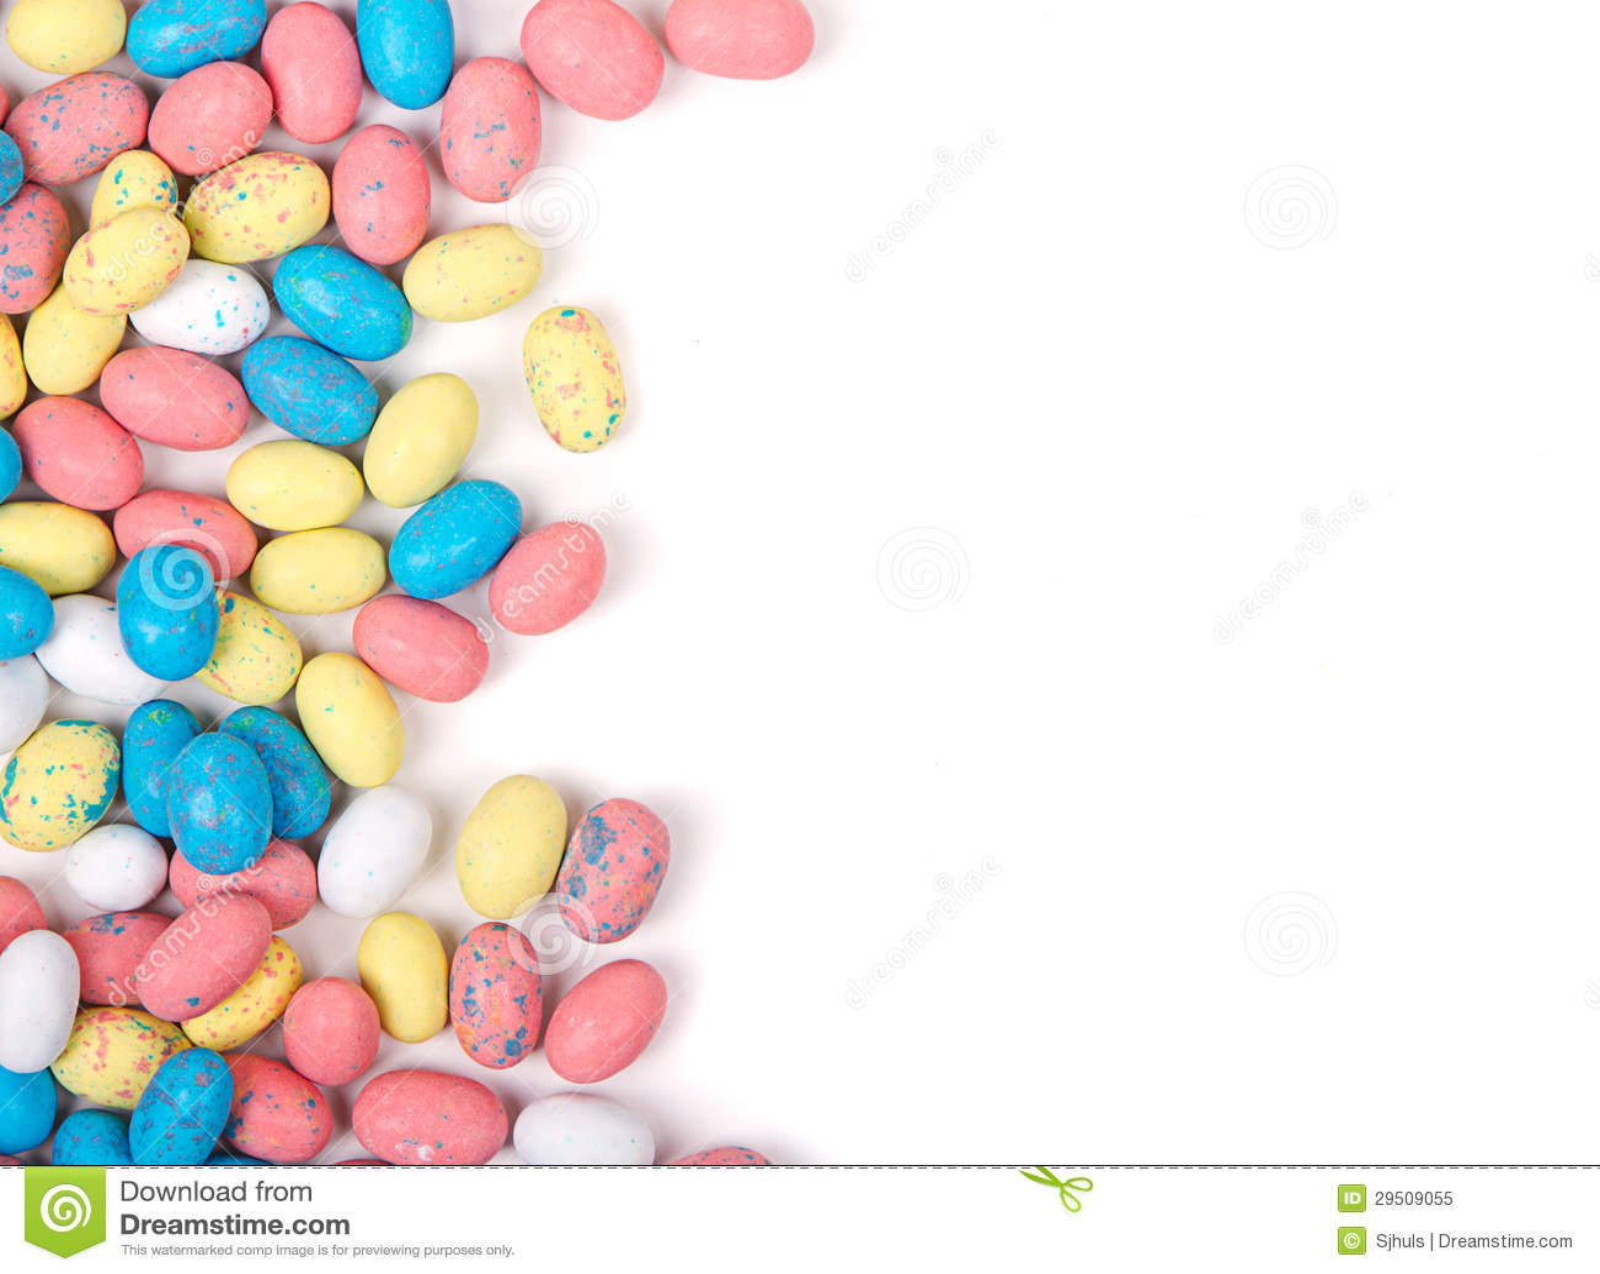 Ei gevormd Pasen suikergoed